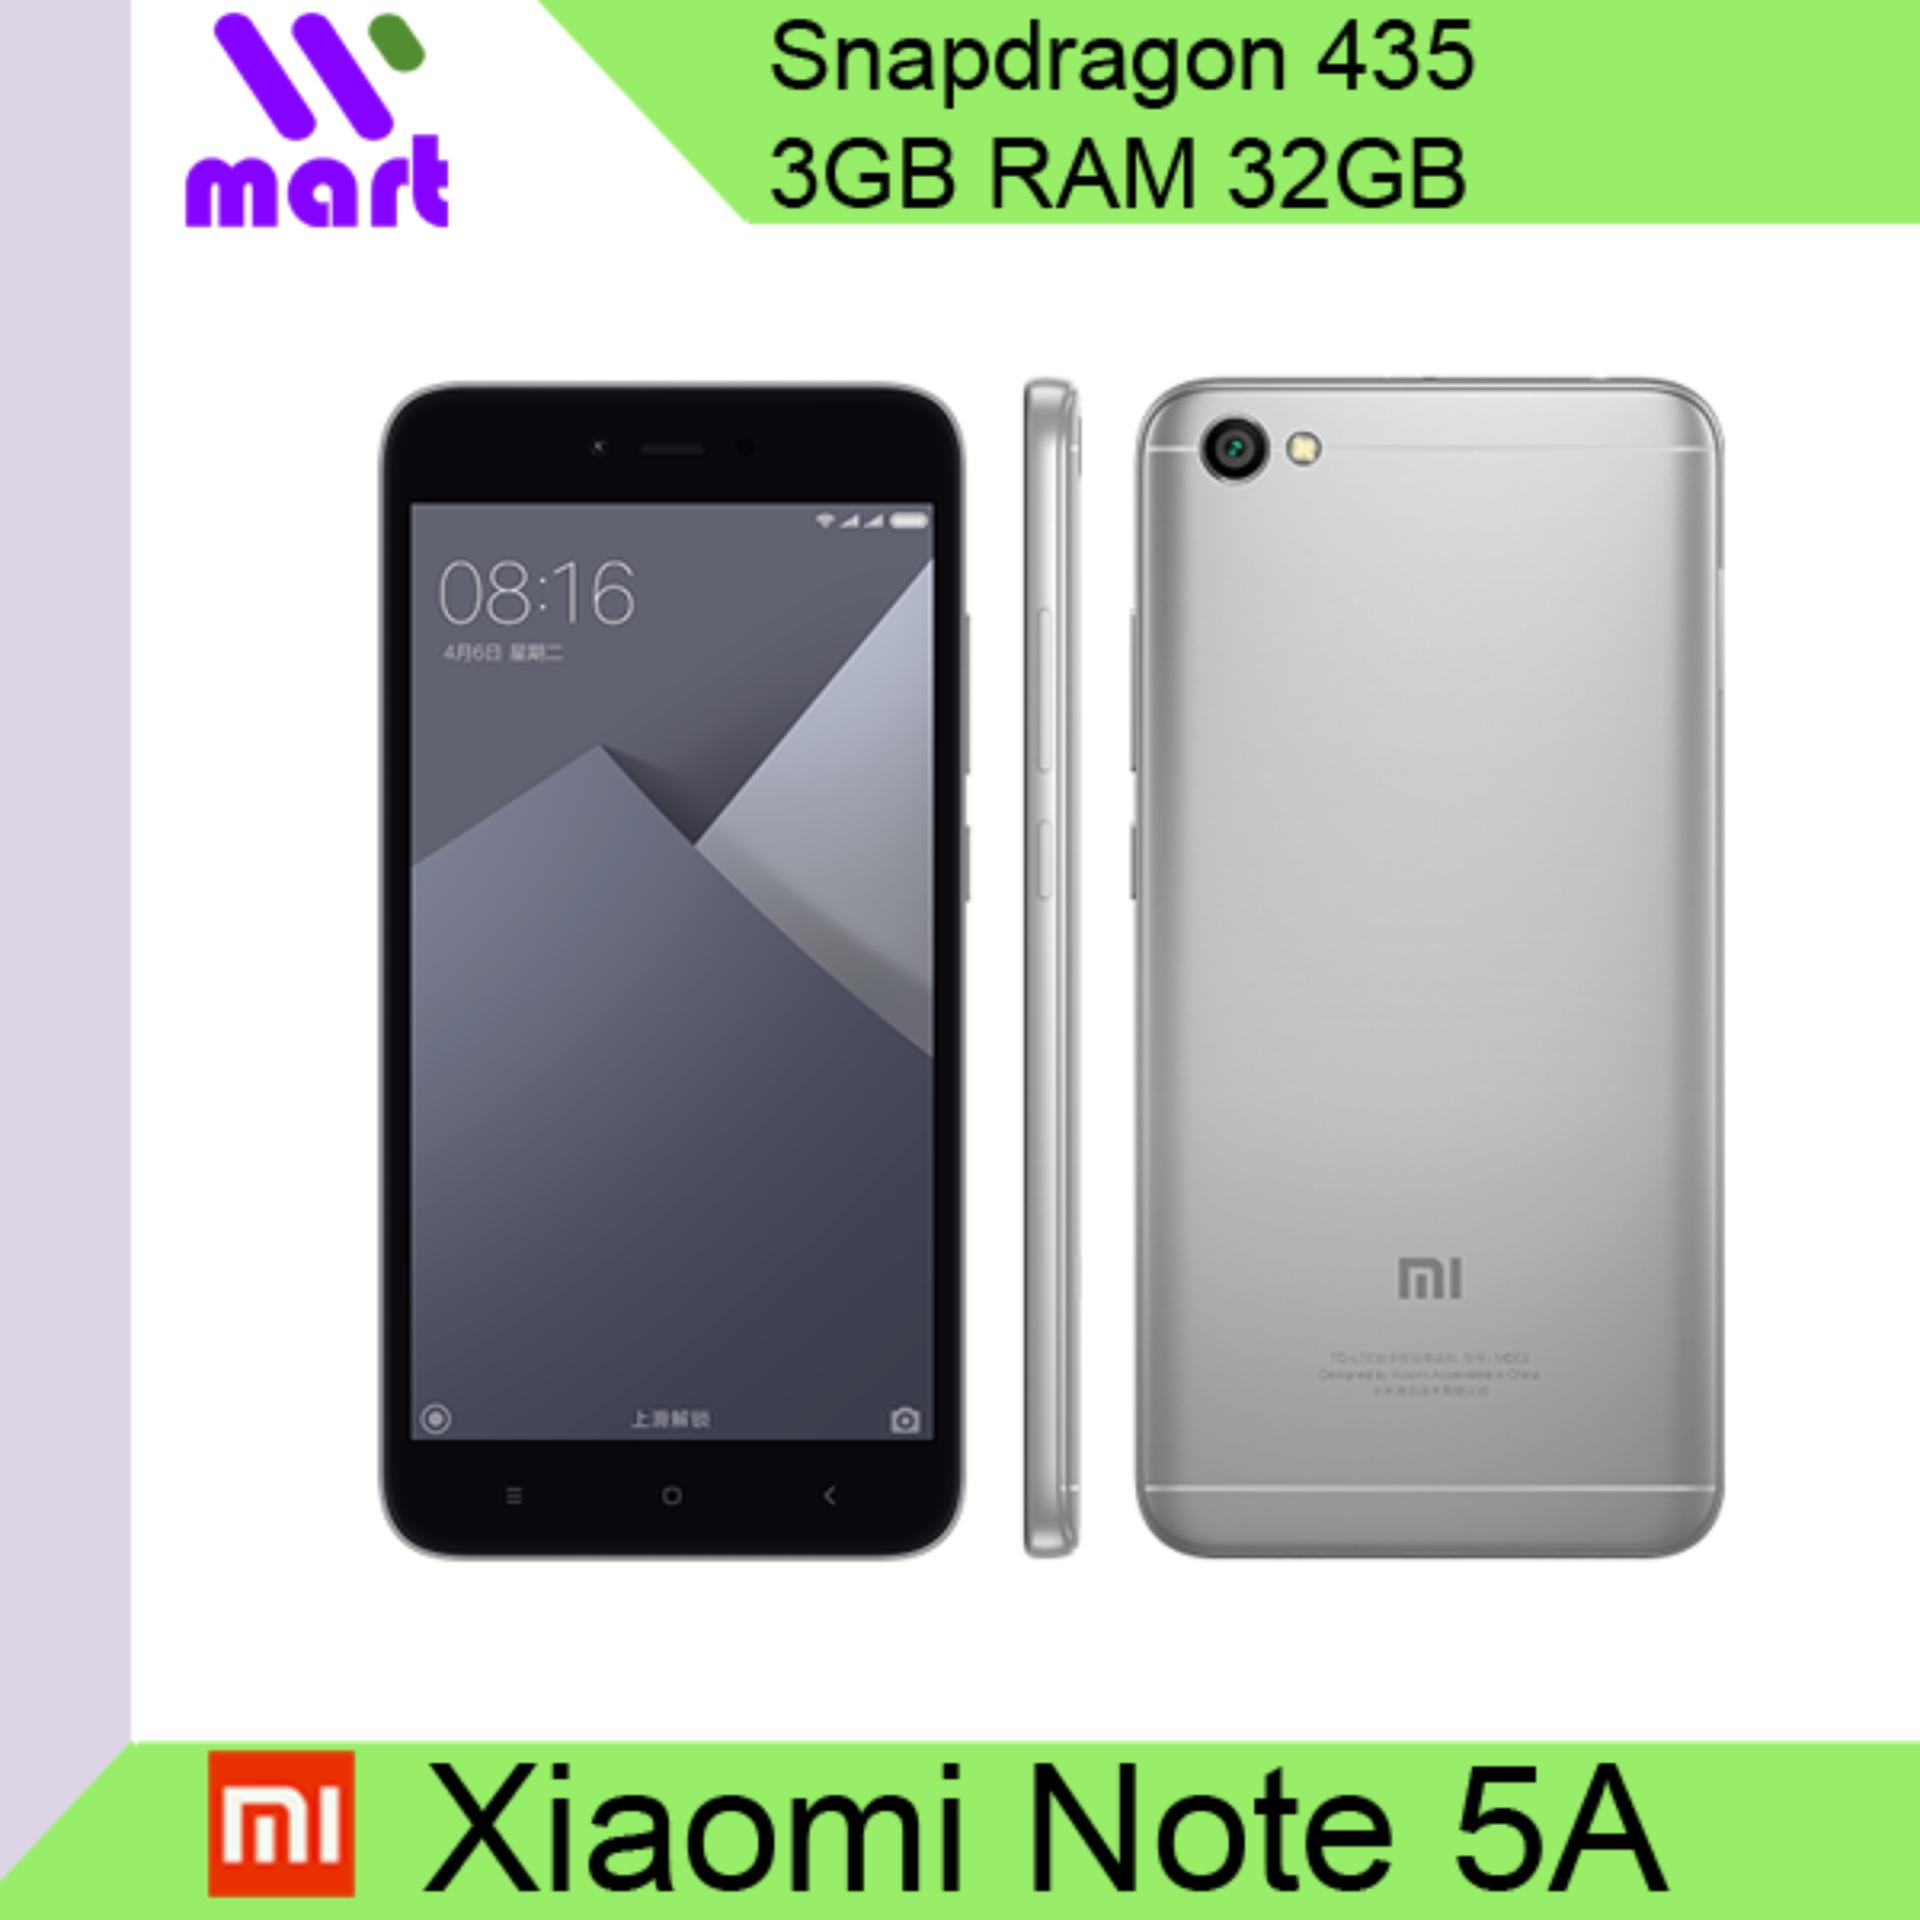 Xiaomi Redmi Note 5A 3GB RAM 32GB International ROM Export